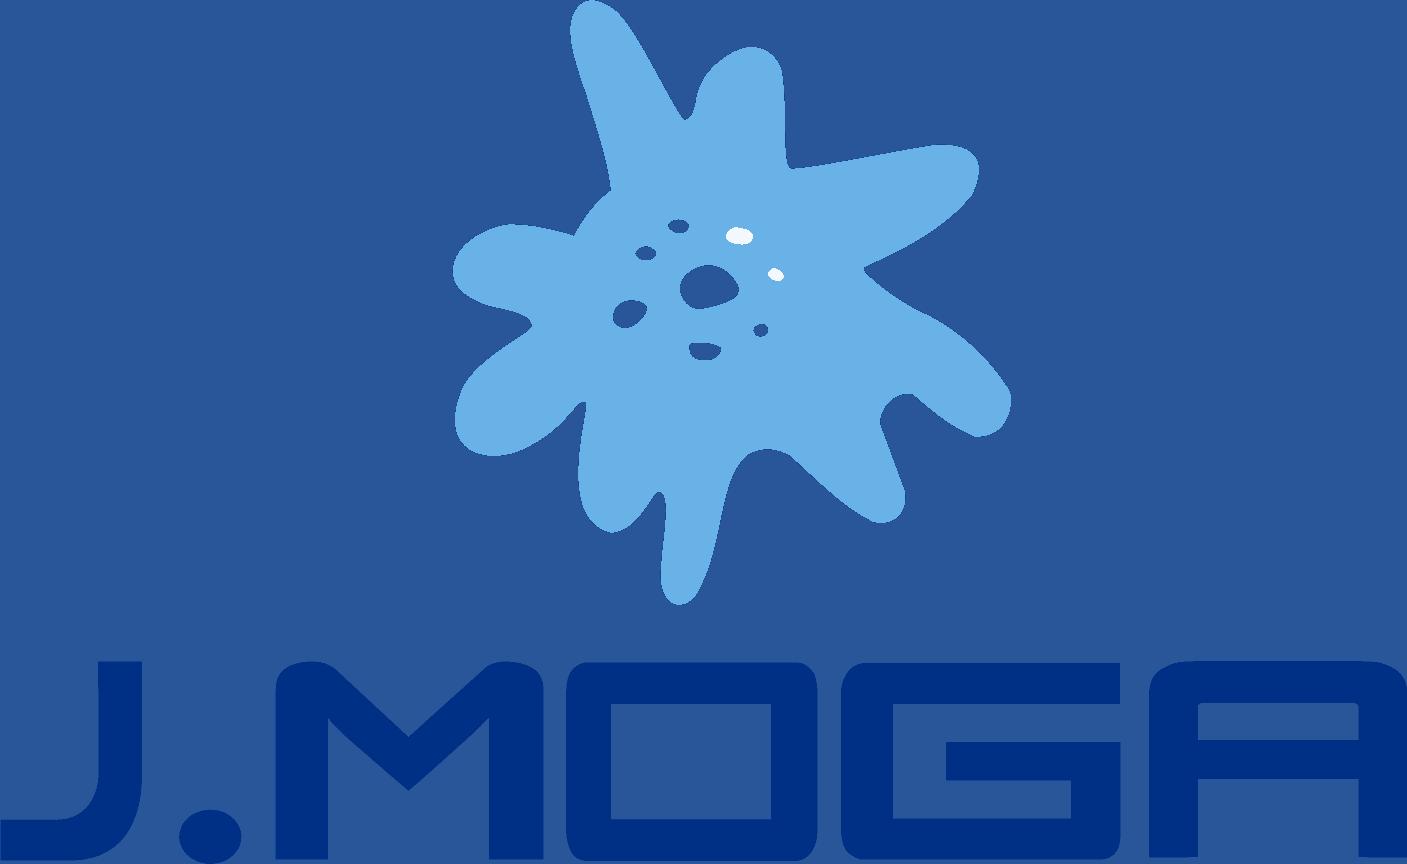 DEPORTES J. MOGA